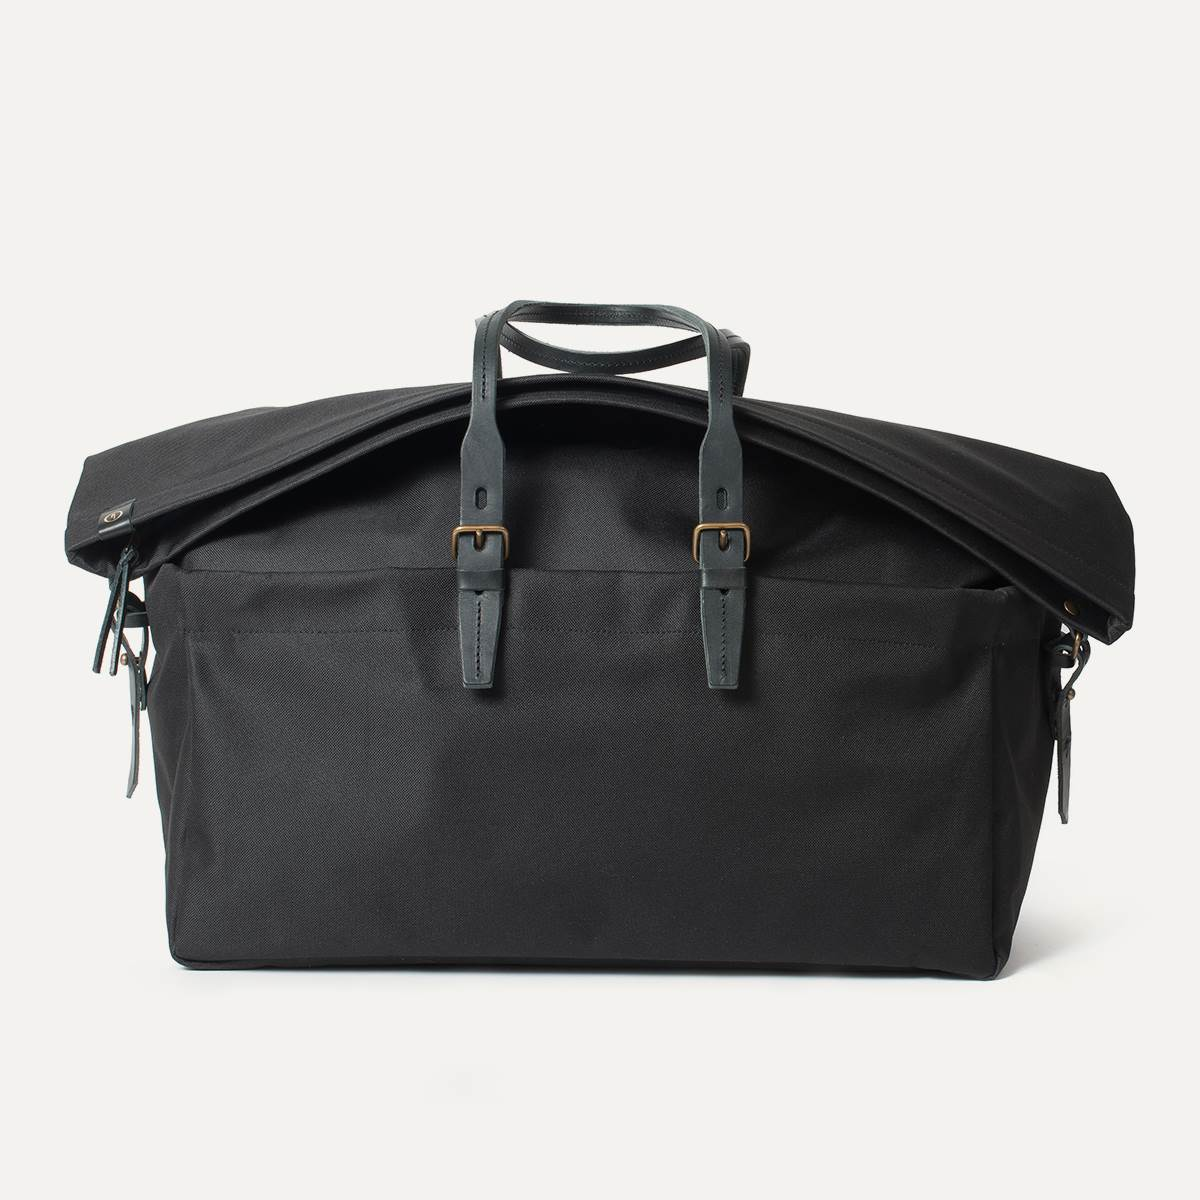 sac voyage cabine